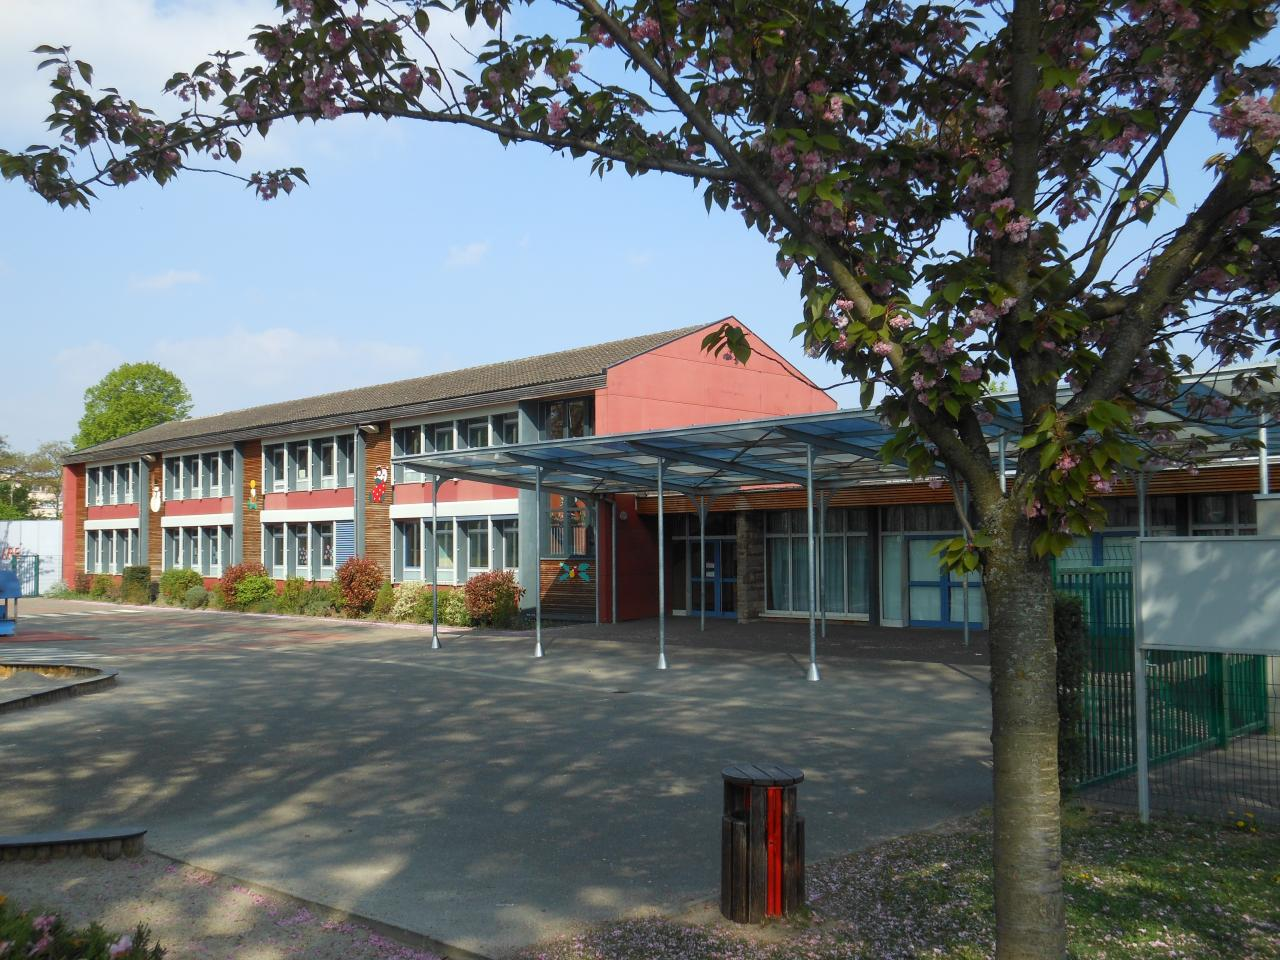 Ecole Erckmann-Chatrian